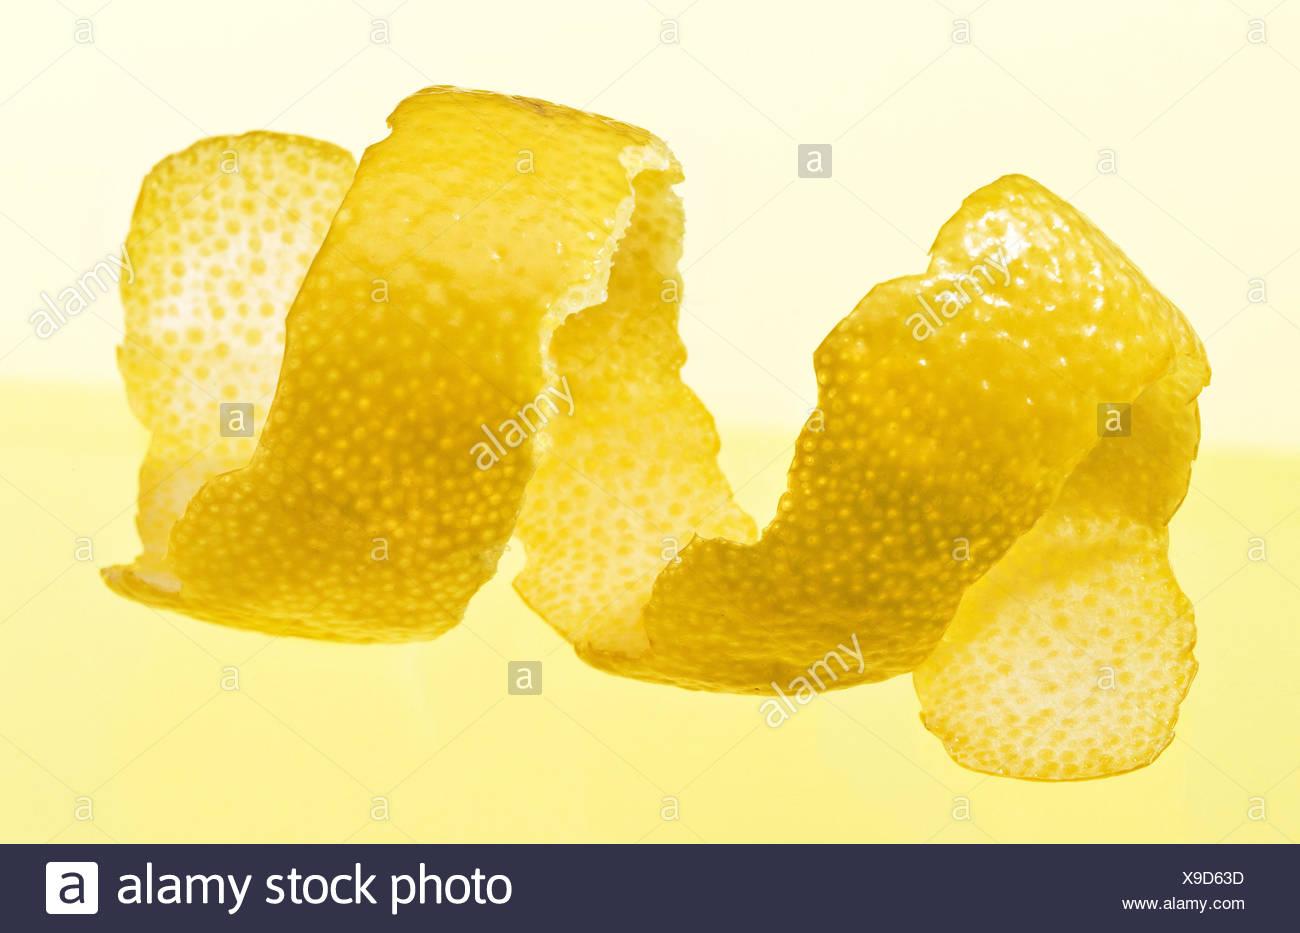 Lemon zest, fruits, peeled, studio, Stilllife, Food, - Stock Image